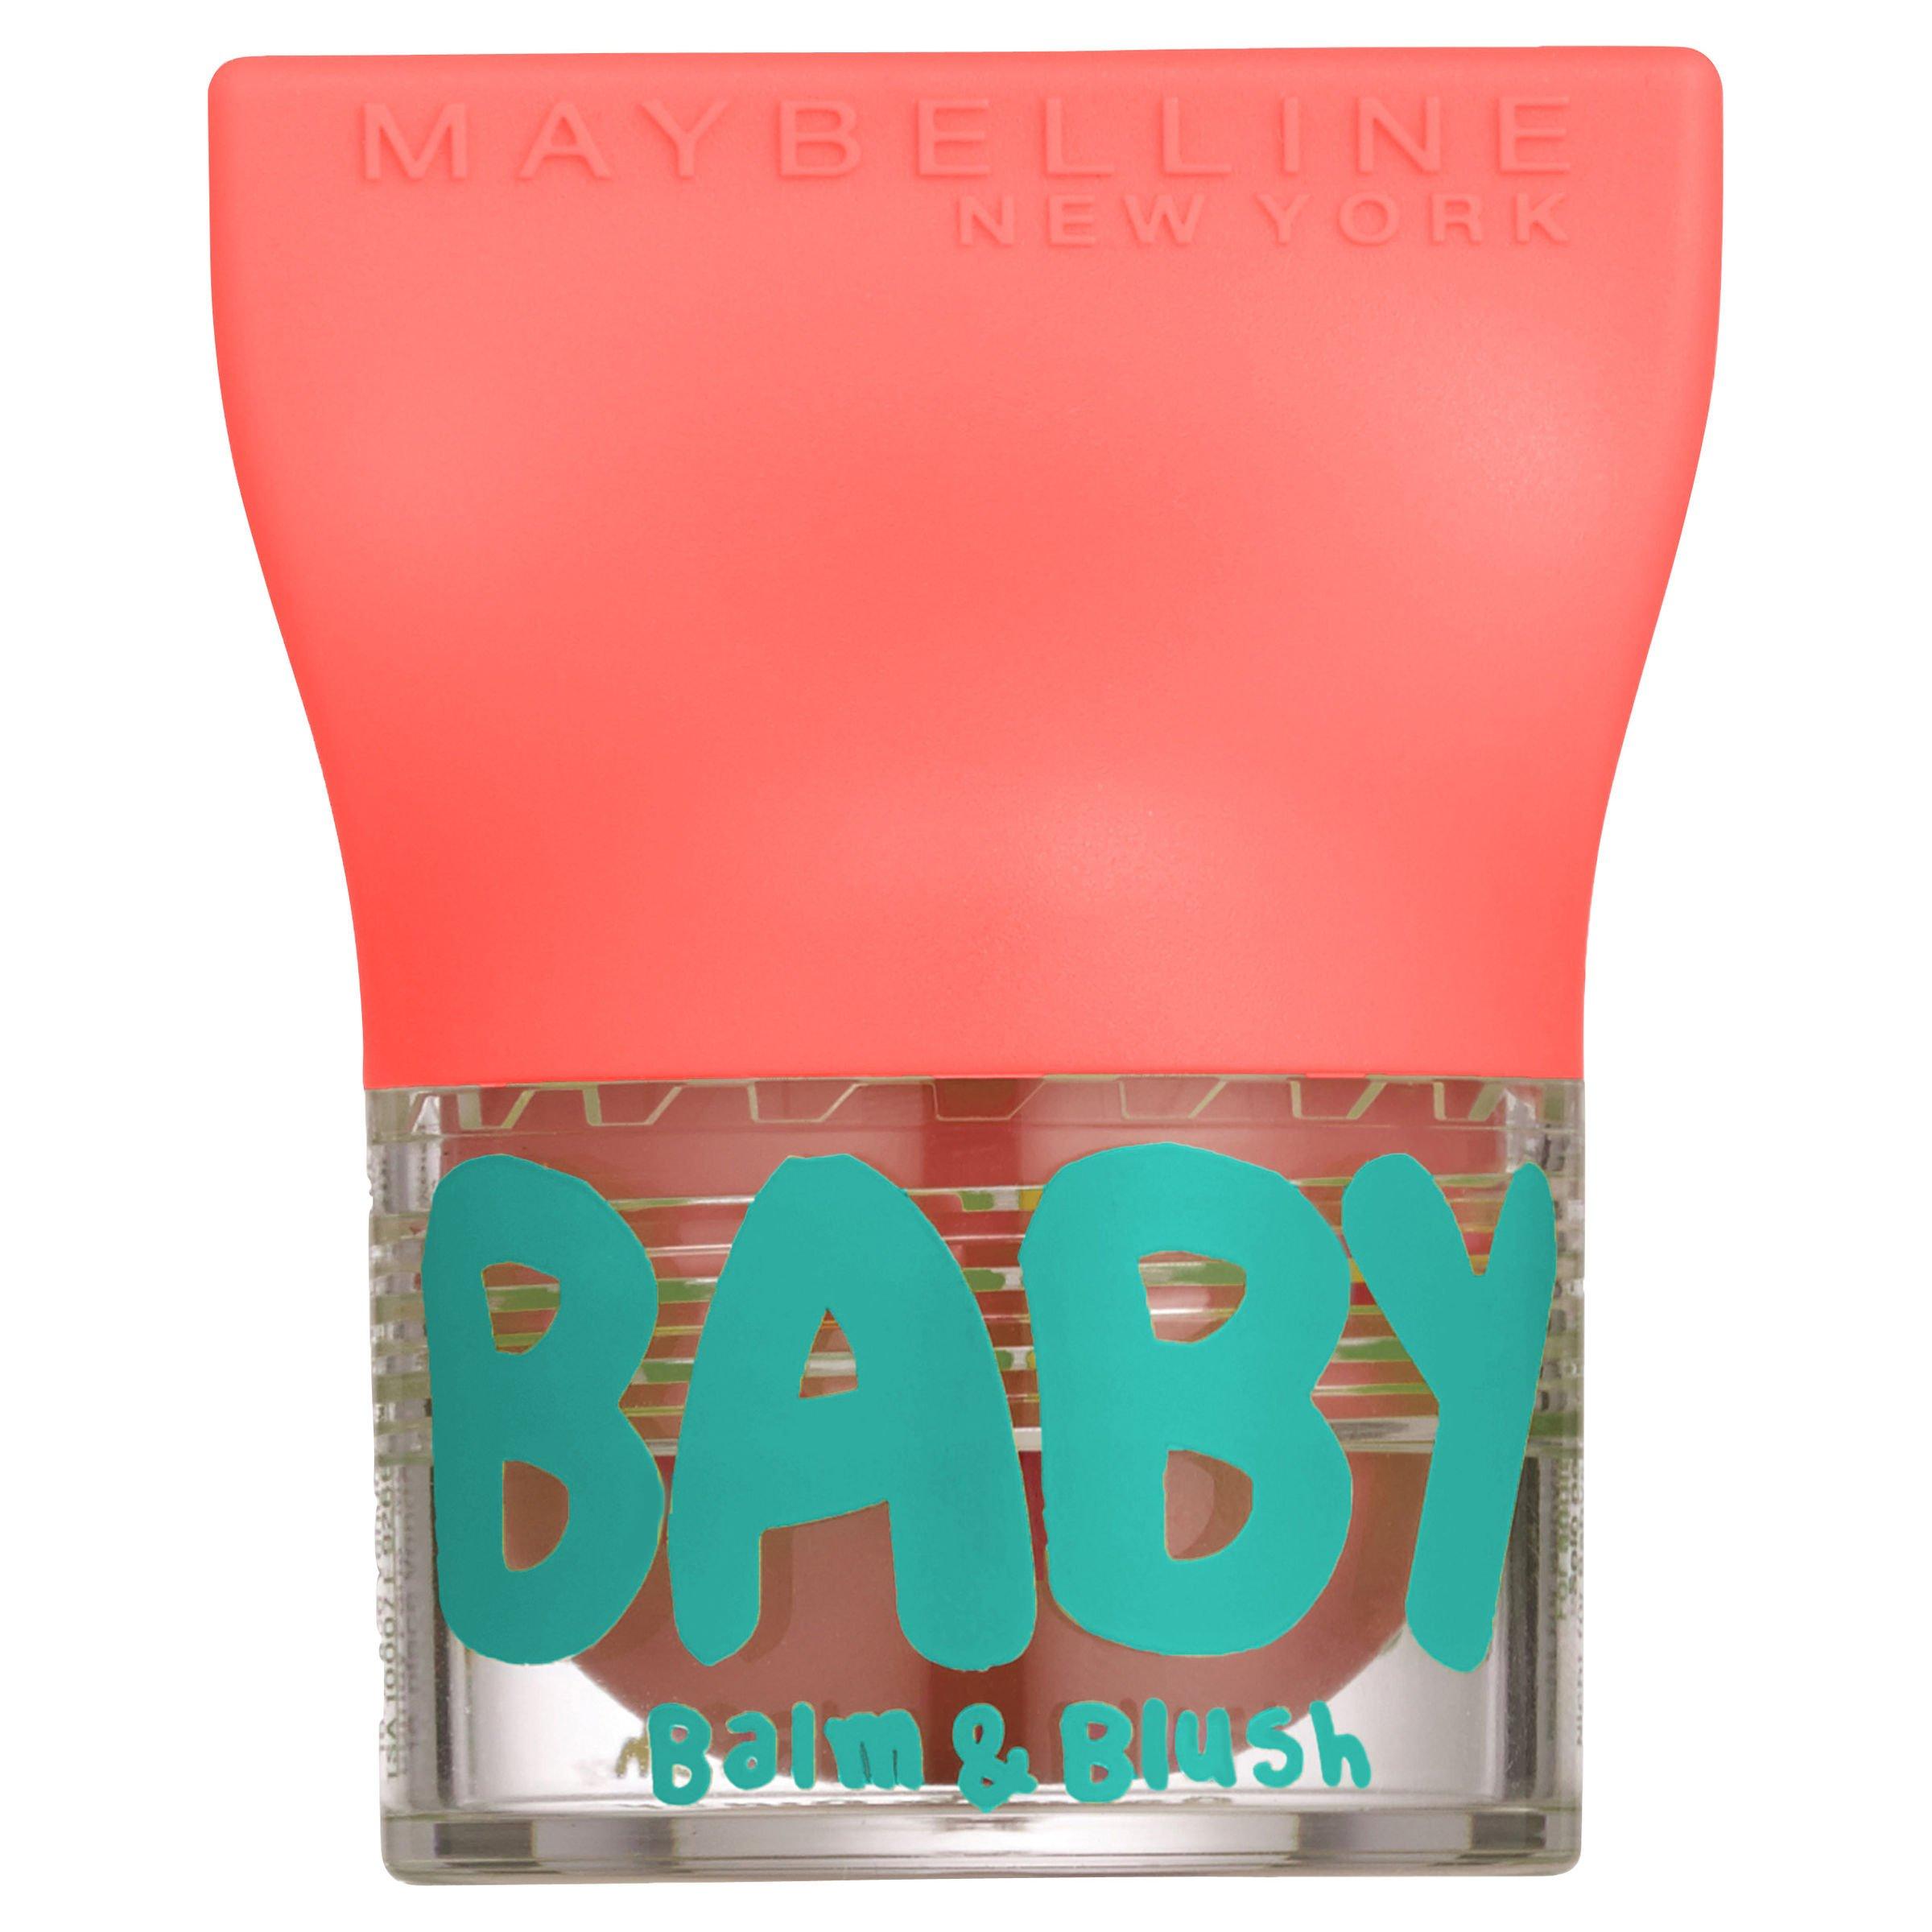 Maybelline New York Bálsamo labial Baby Lips Blam & Blush 1 Innocent Peach product image